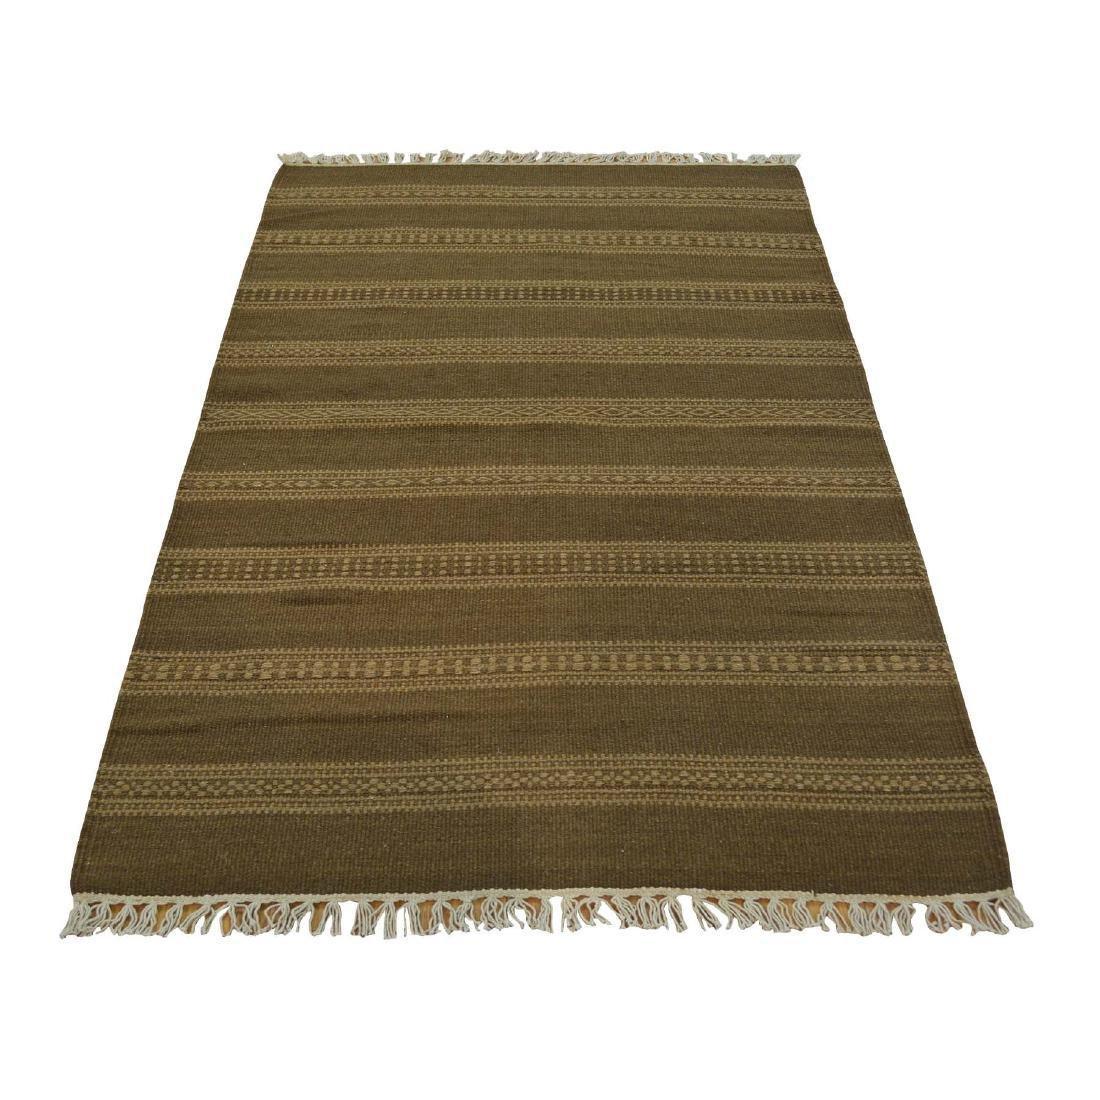 Wool Durie Kilim Rug Hand Woven Flat Weave 3x5.1